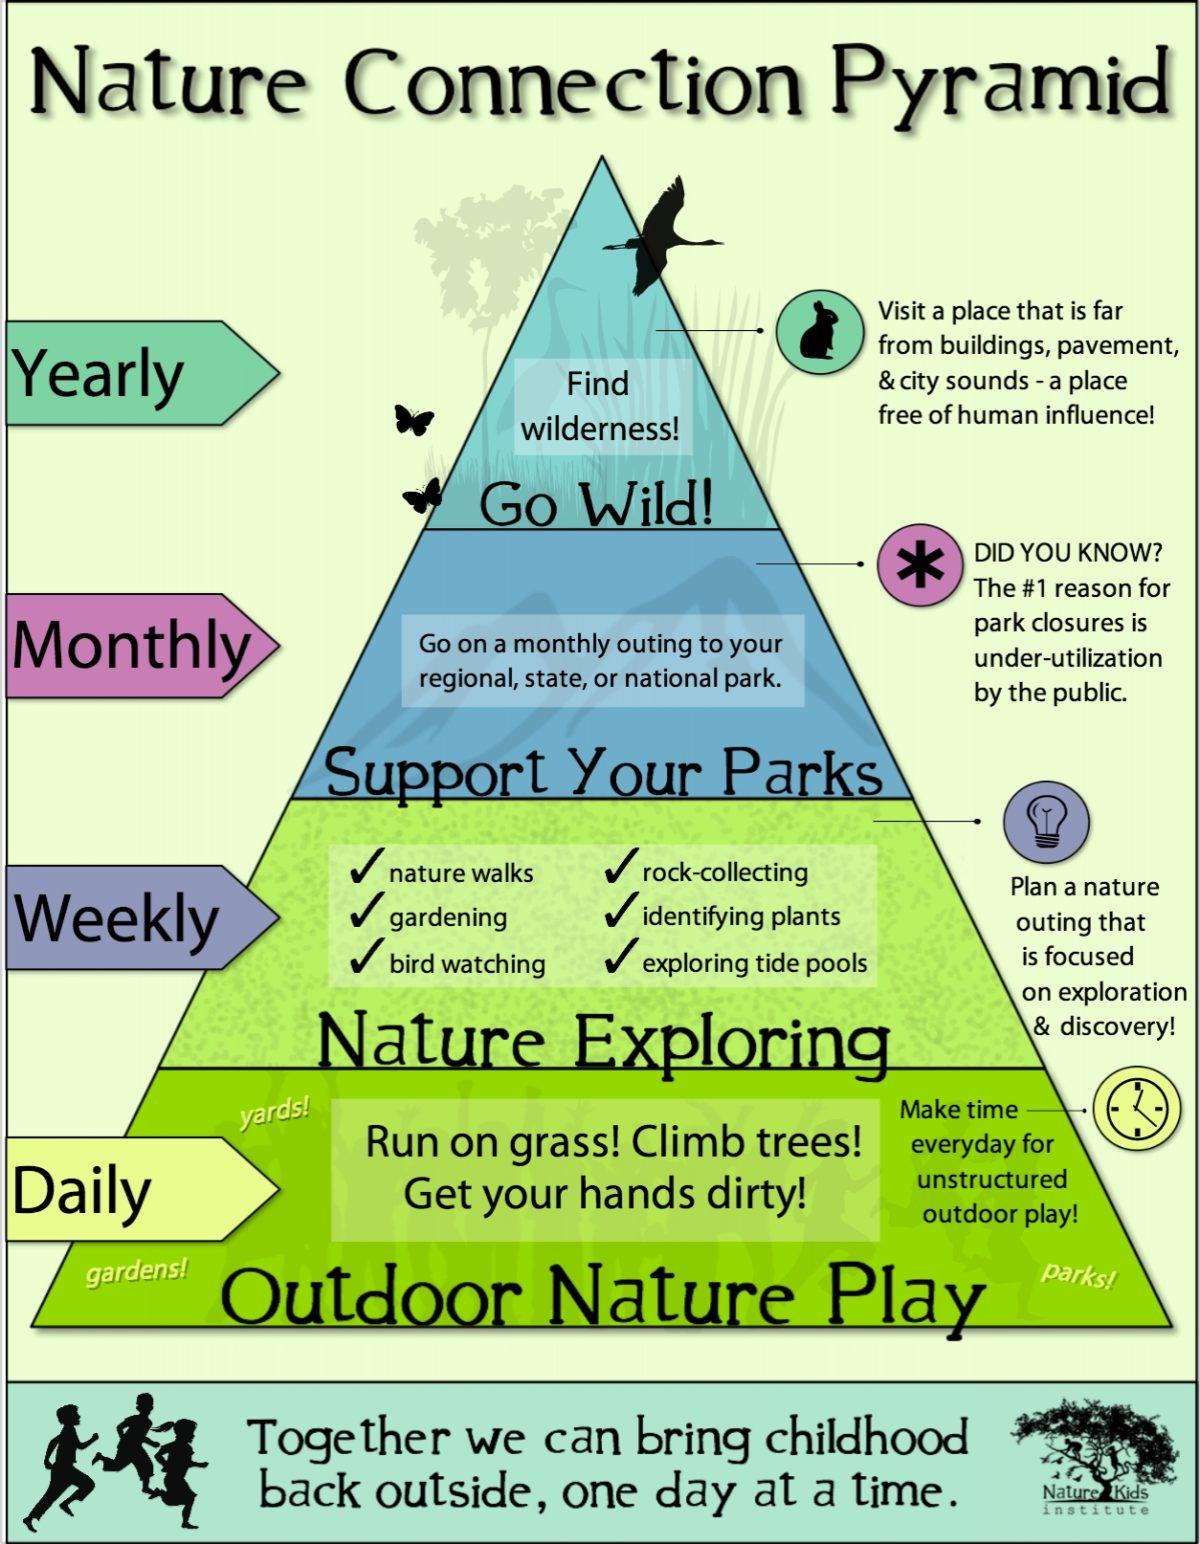 Nature pyramid!